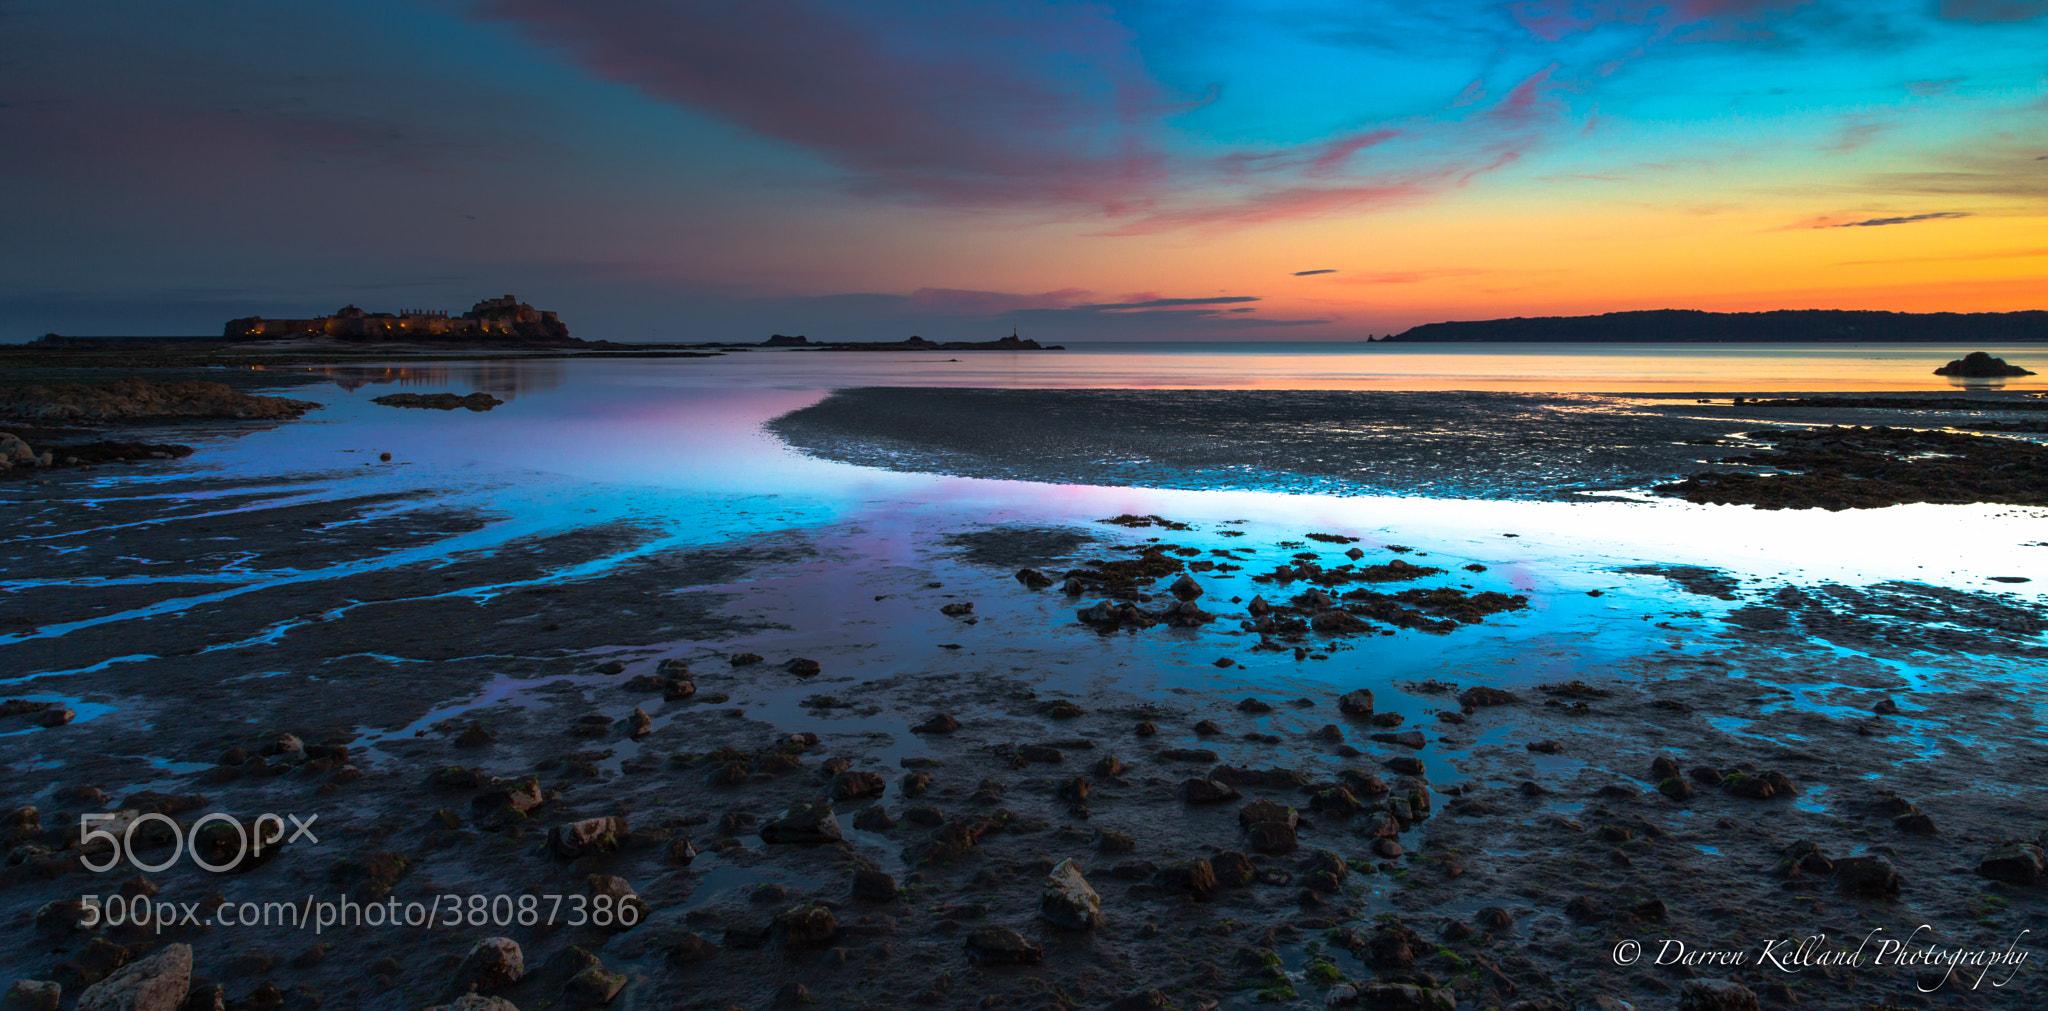 Photograph Twilight Part II by Darren Kelland on 500px